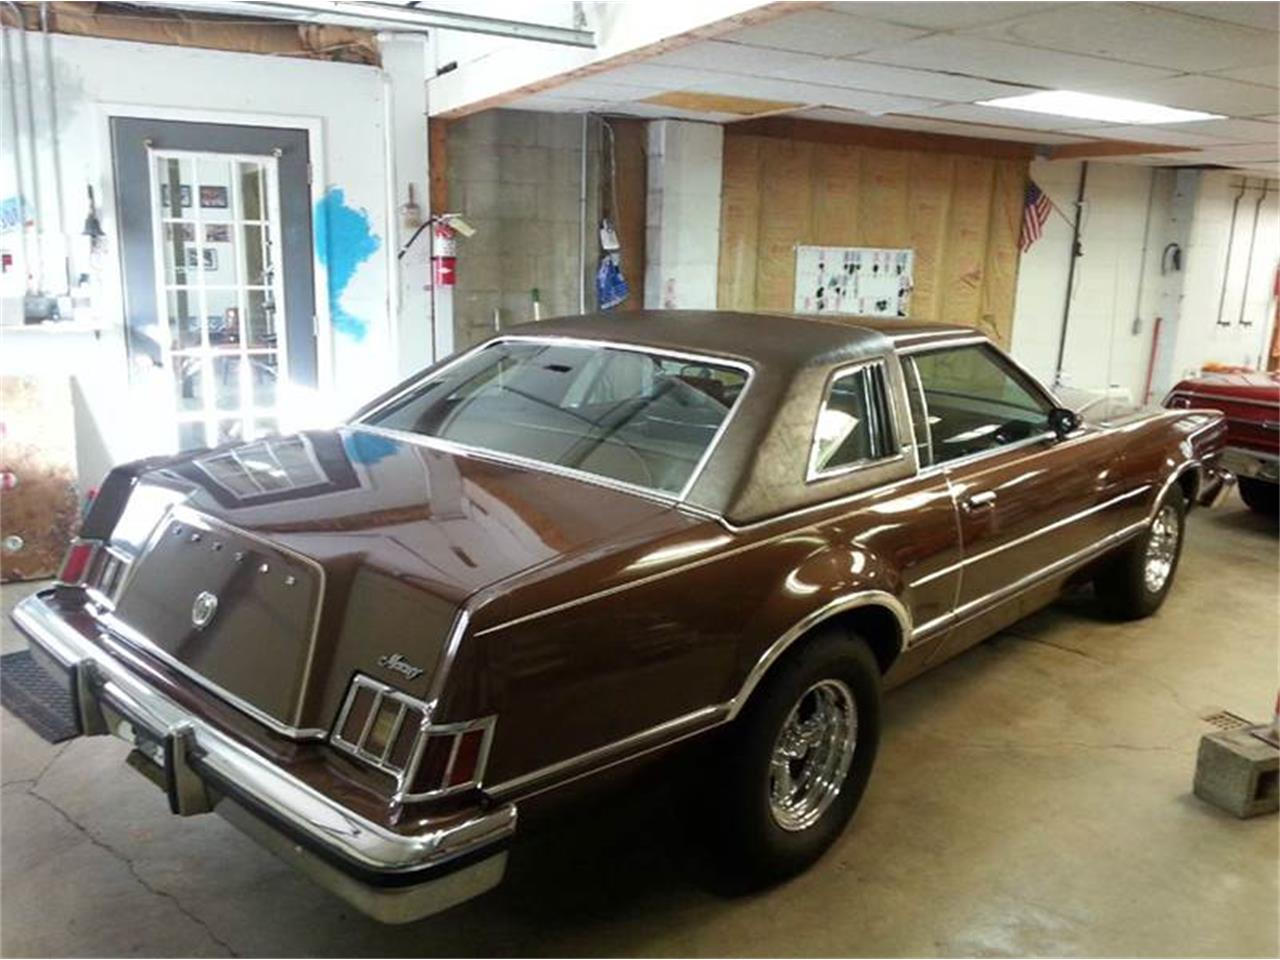 Large Picture of '77 Mercury Cougar - $6,000.00 - N53N